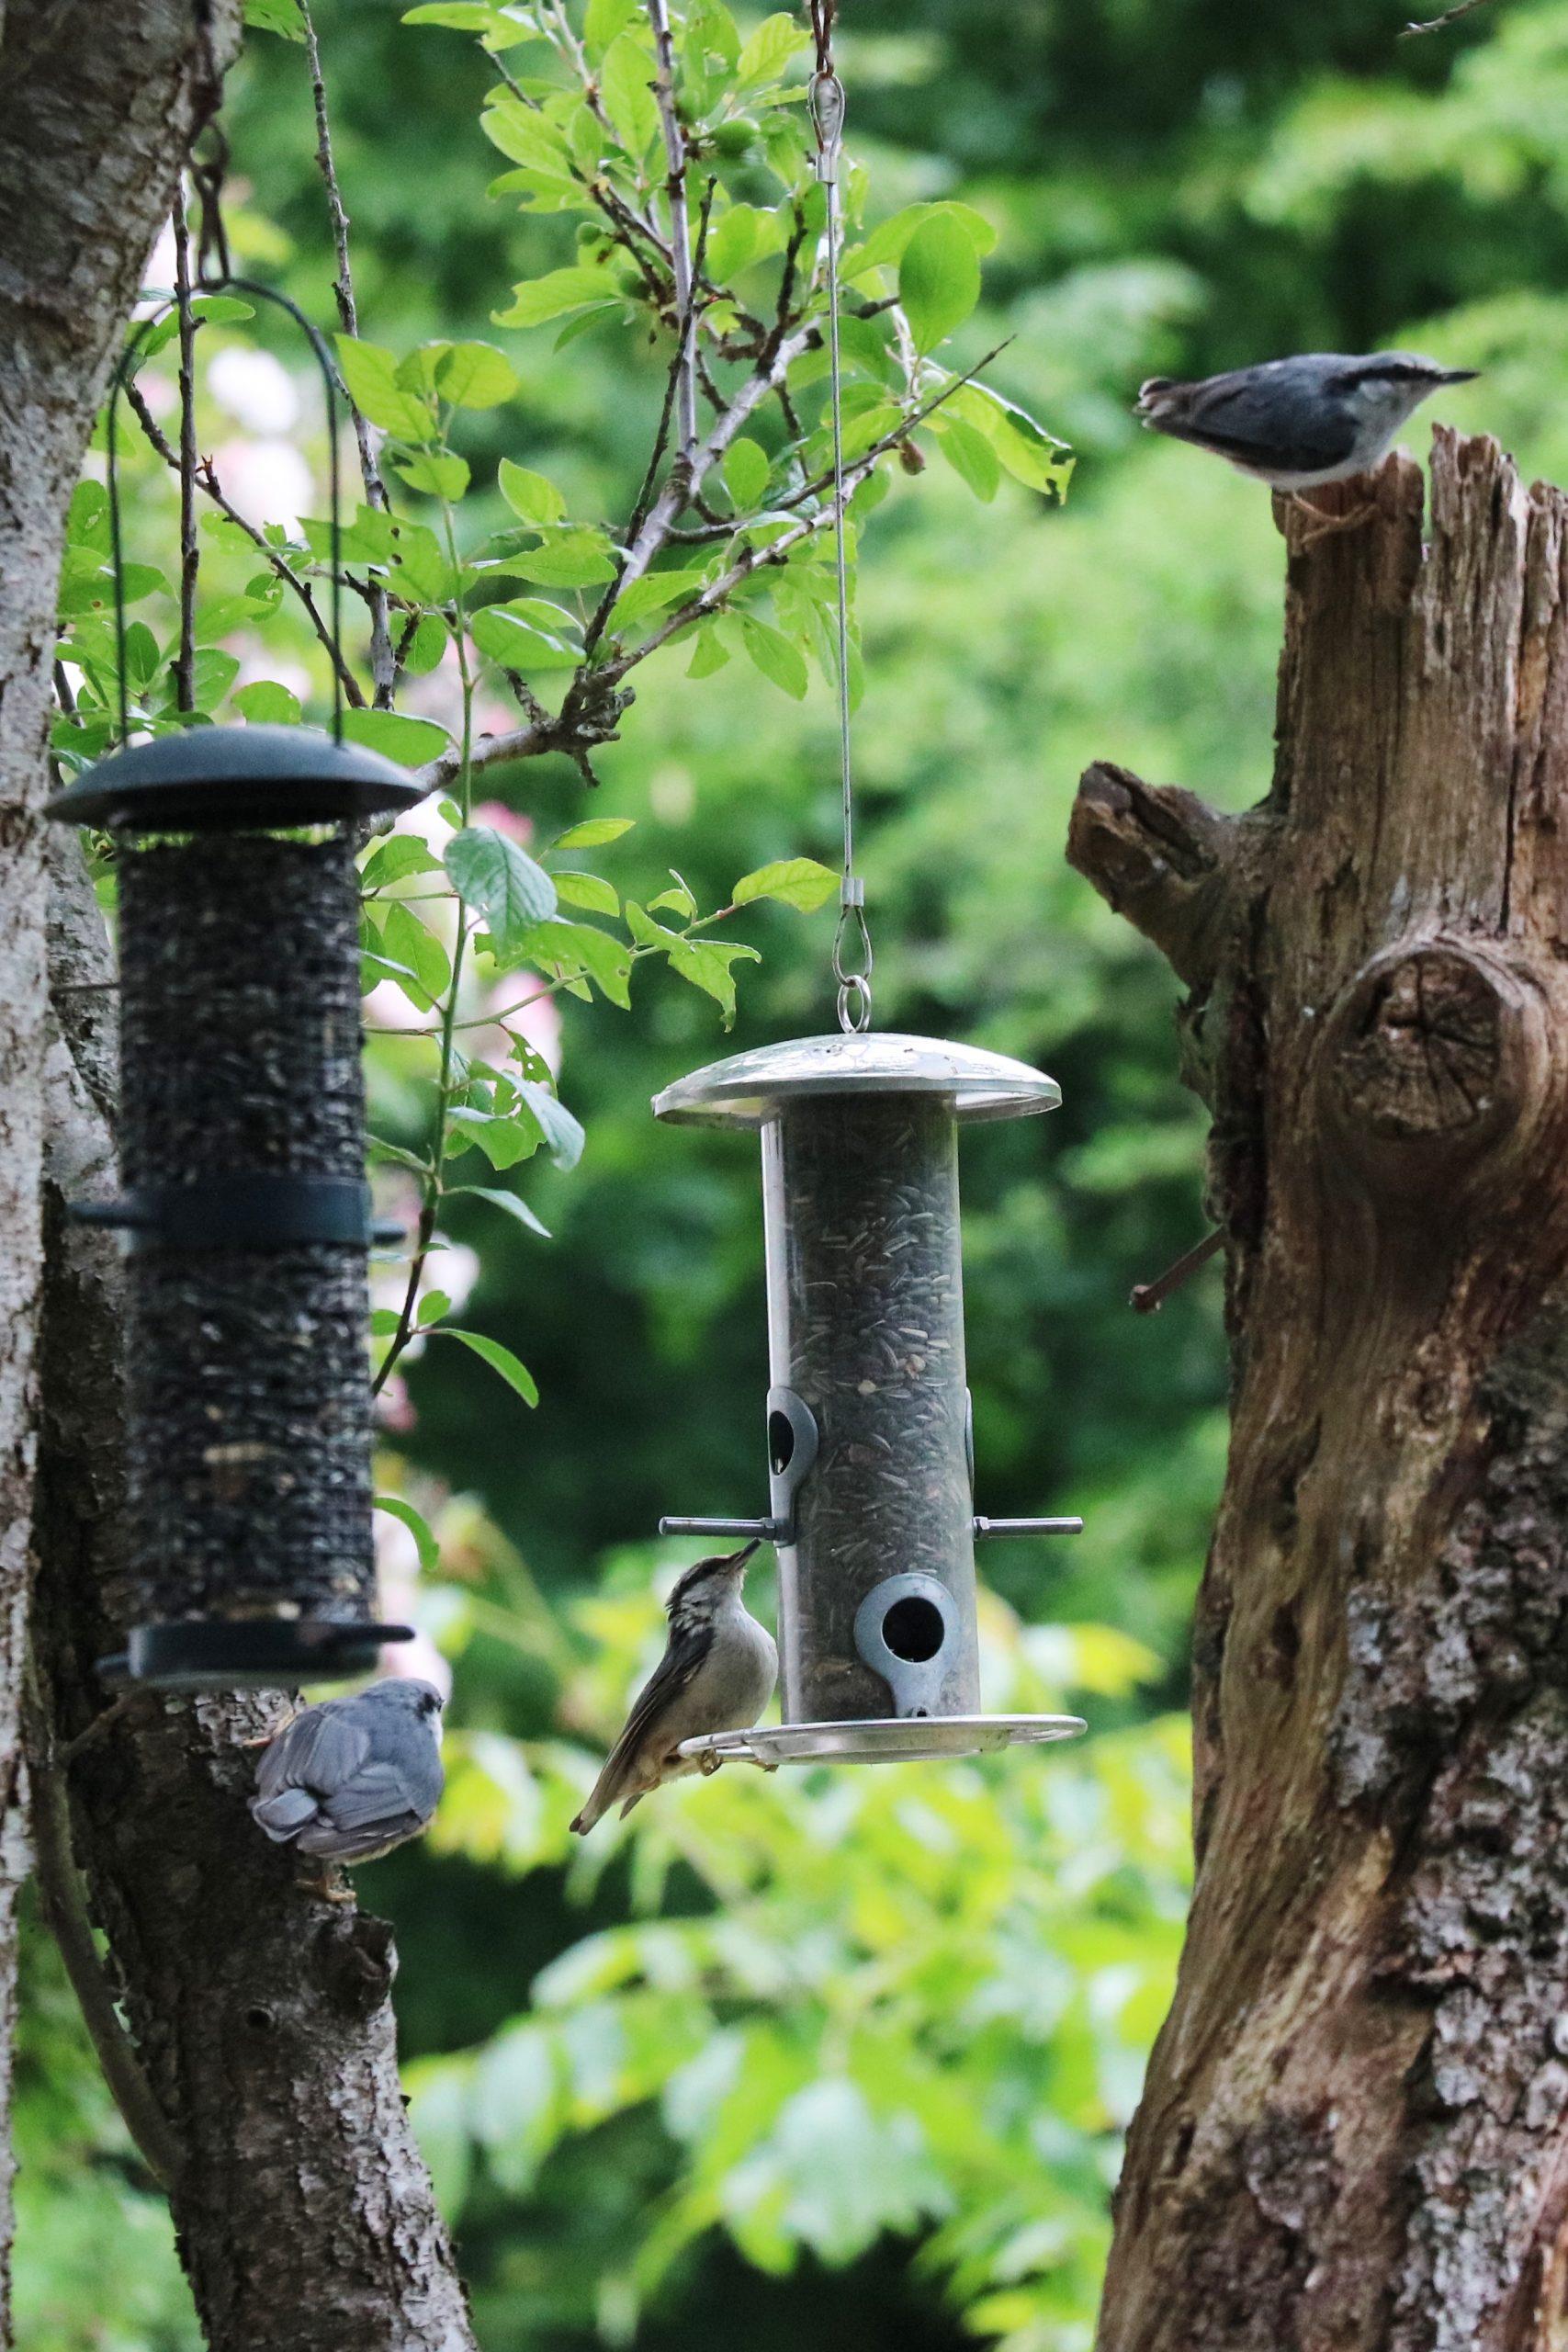 Bird feeders in use